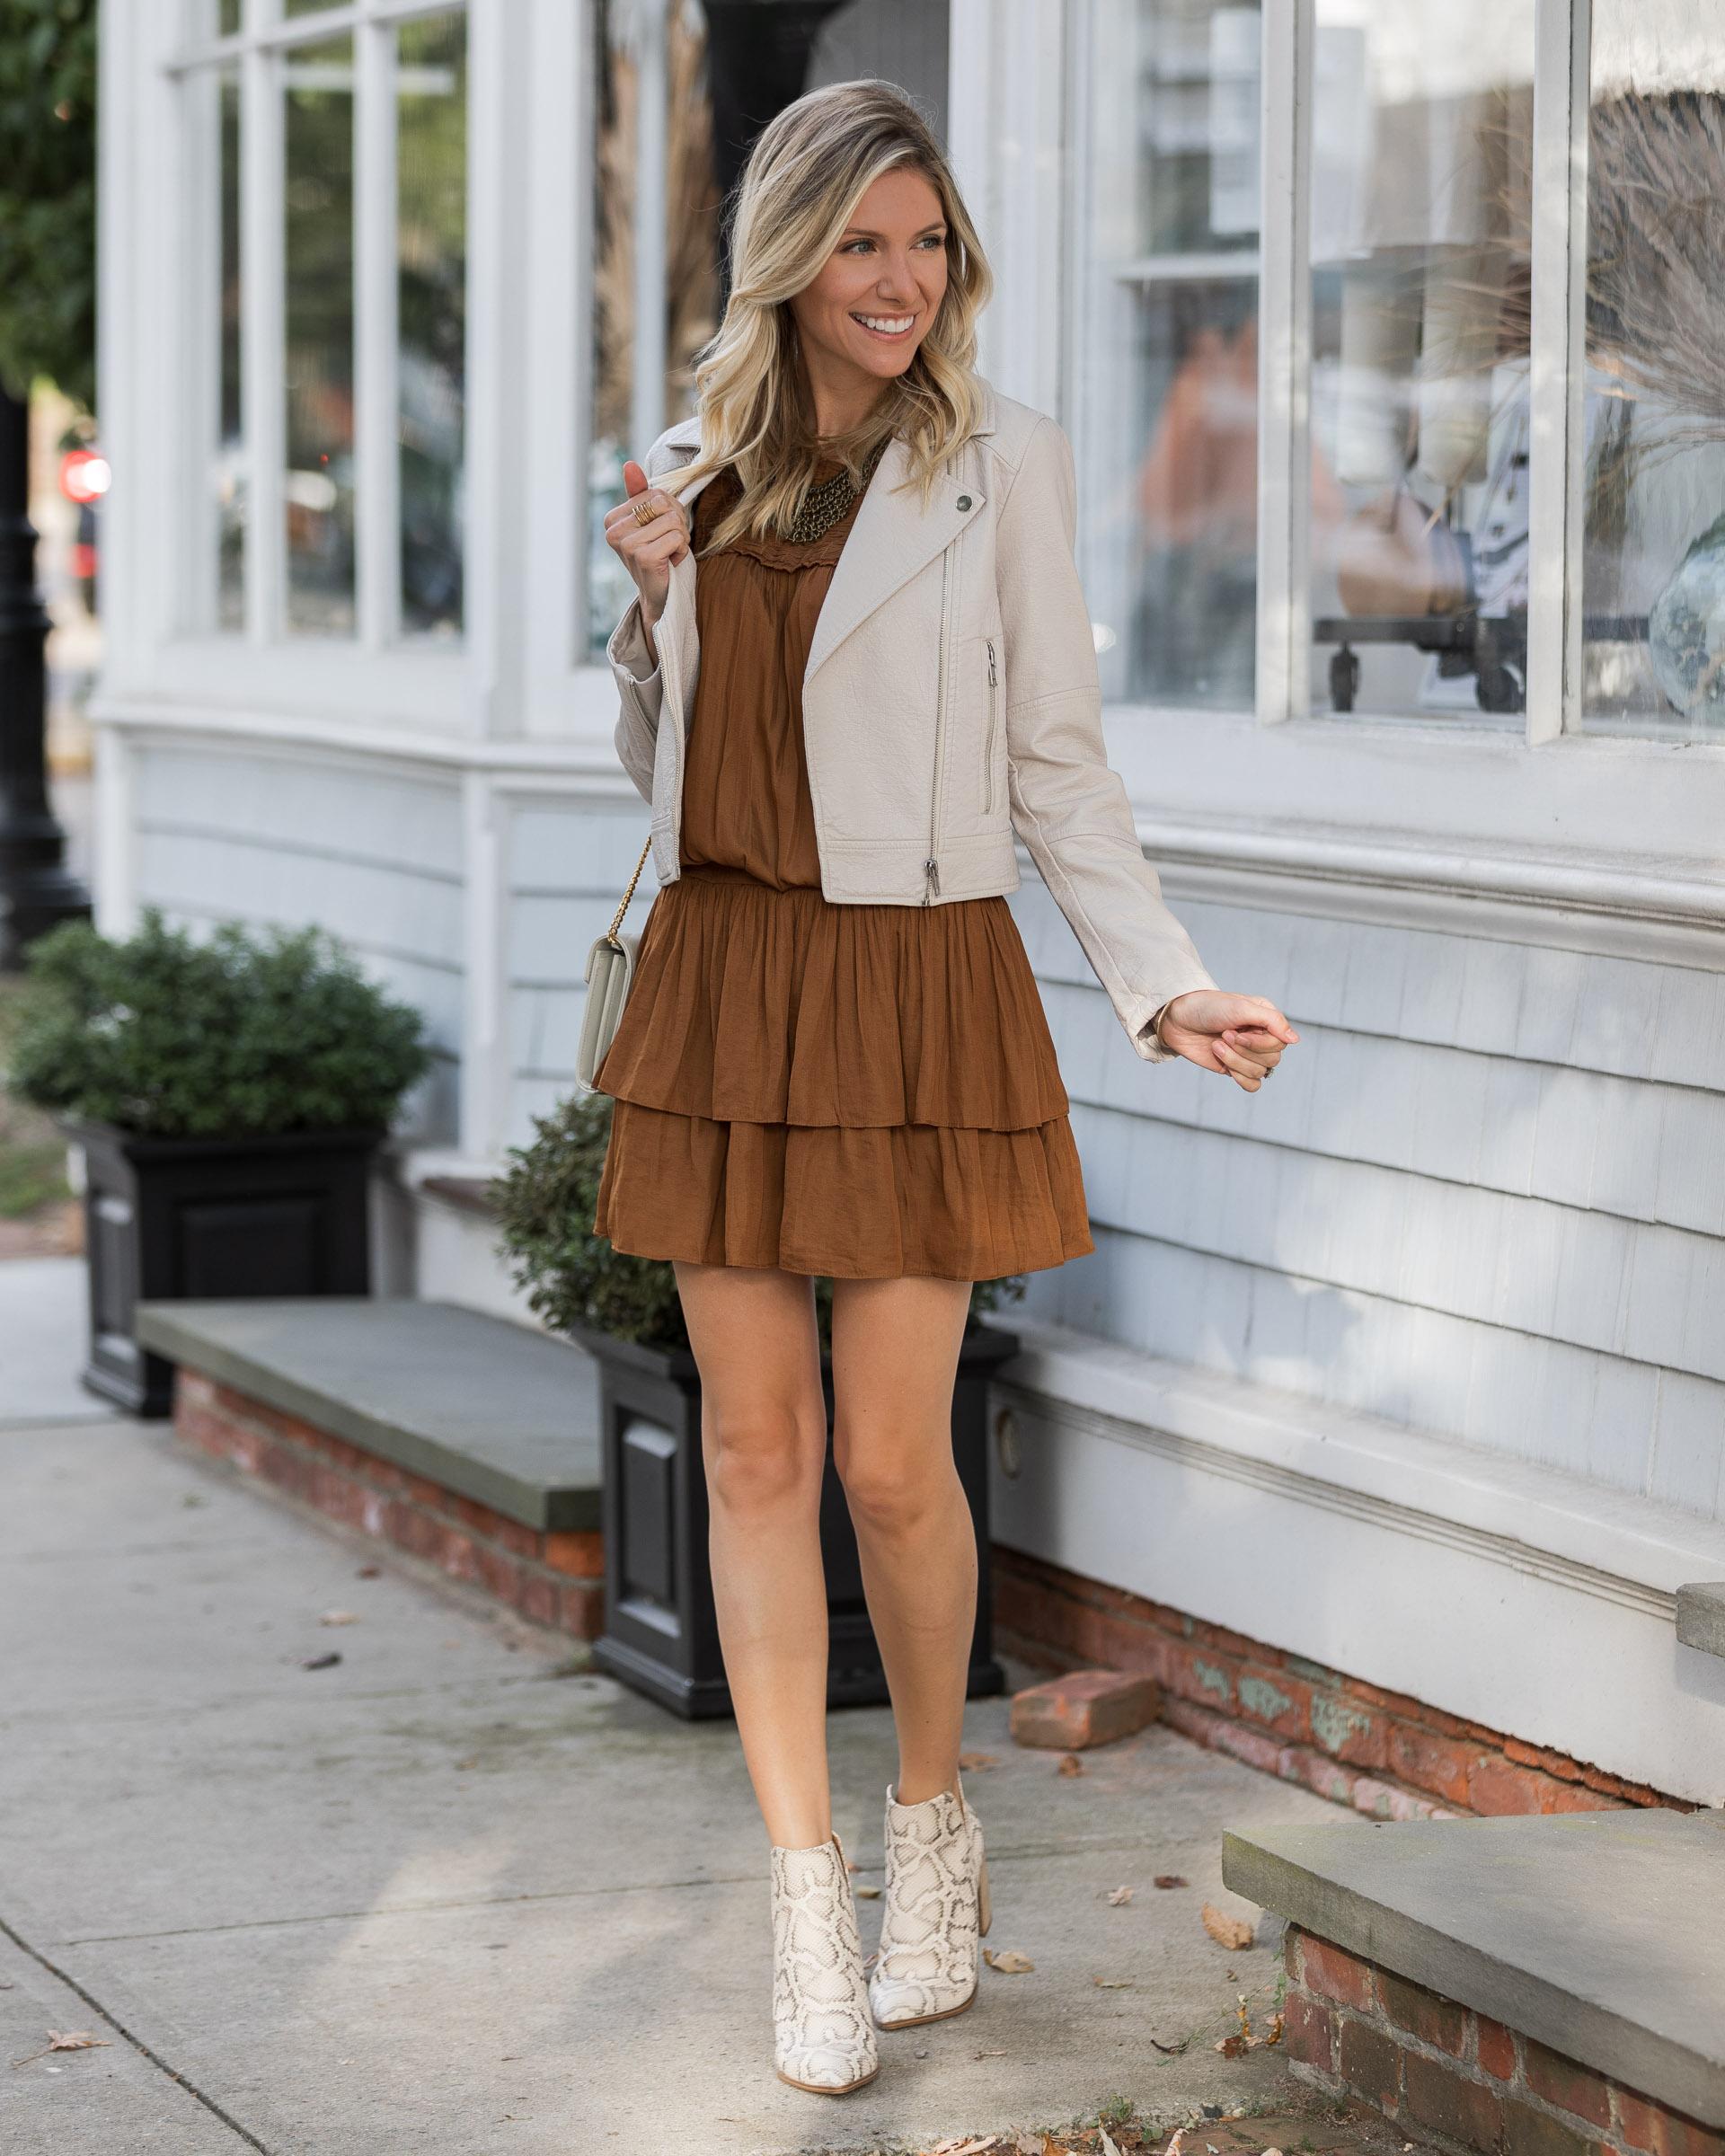 rust-ruffle-dress-for-fall-the-glamorous-gal